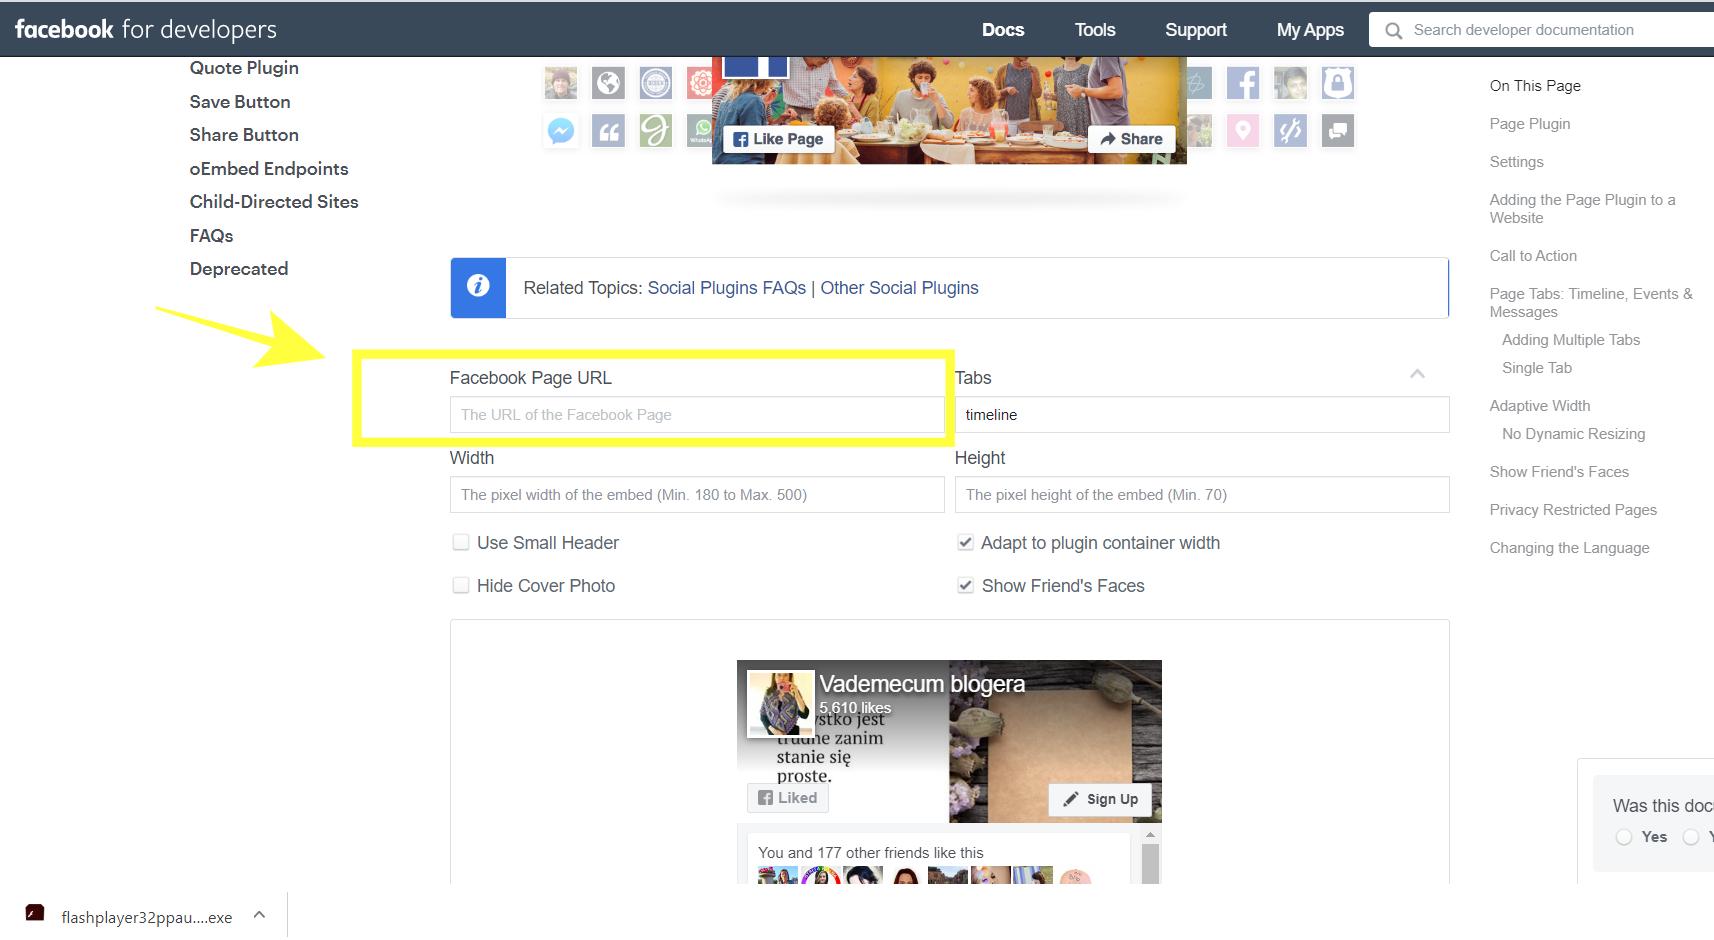 Jak dodać okienko facebooka (likeboxa) na wordpressa?